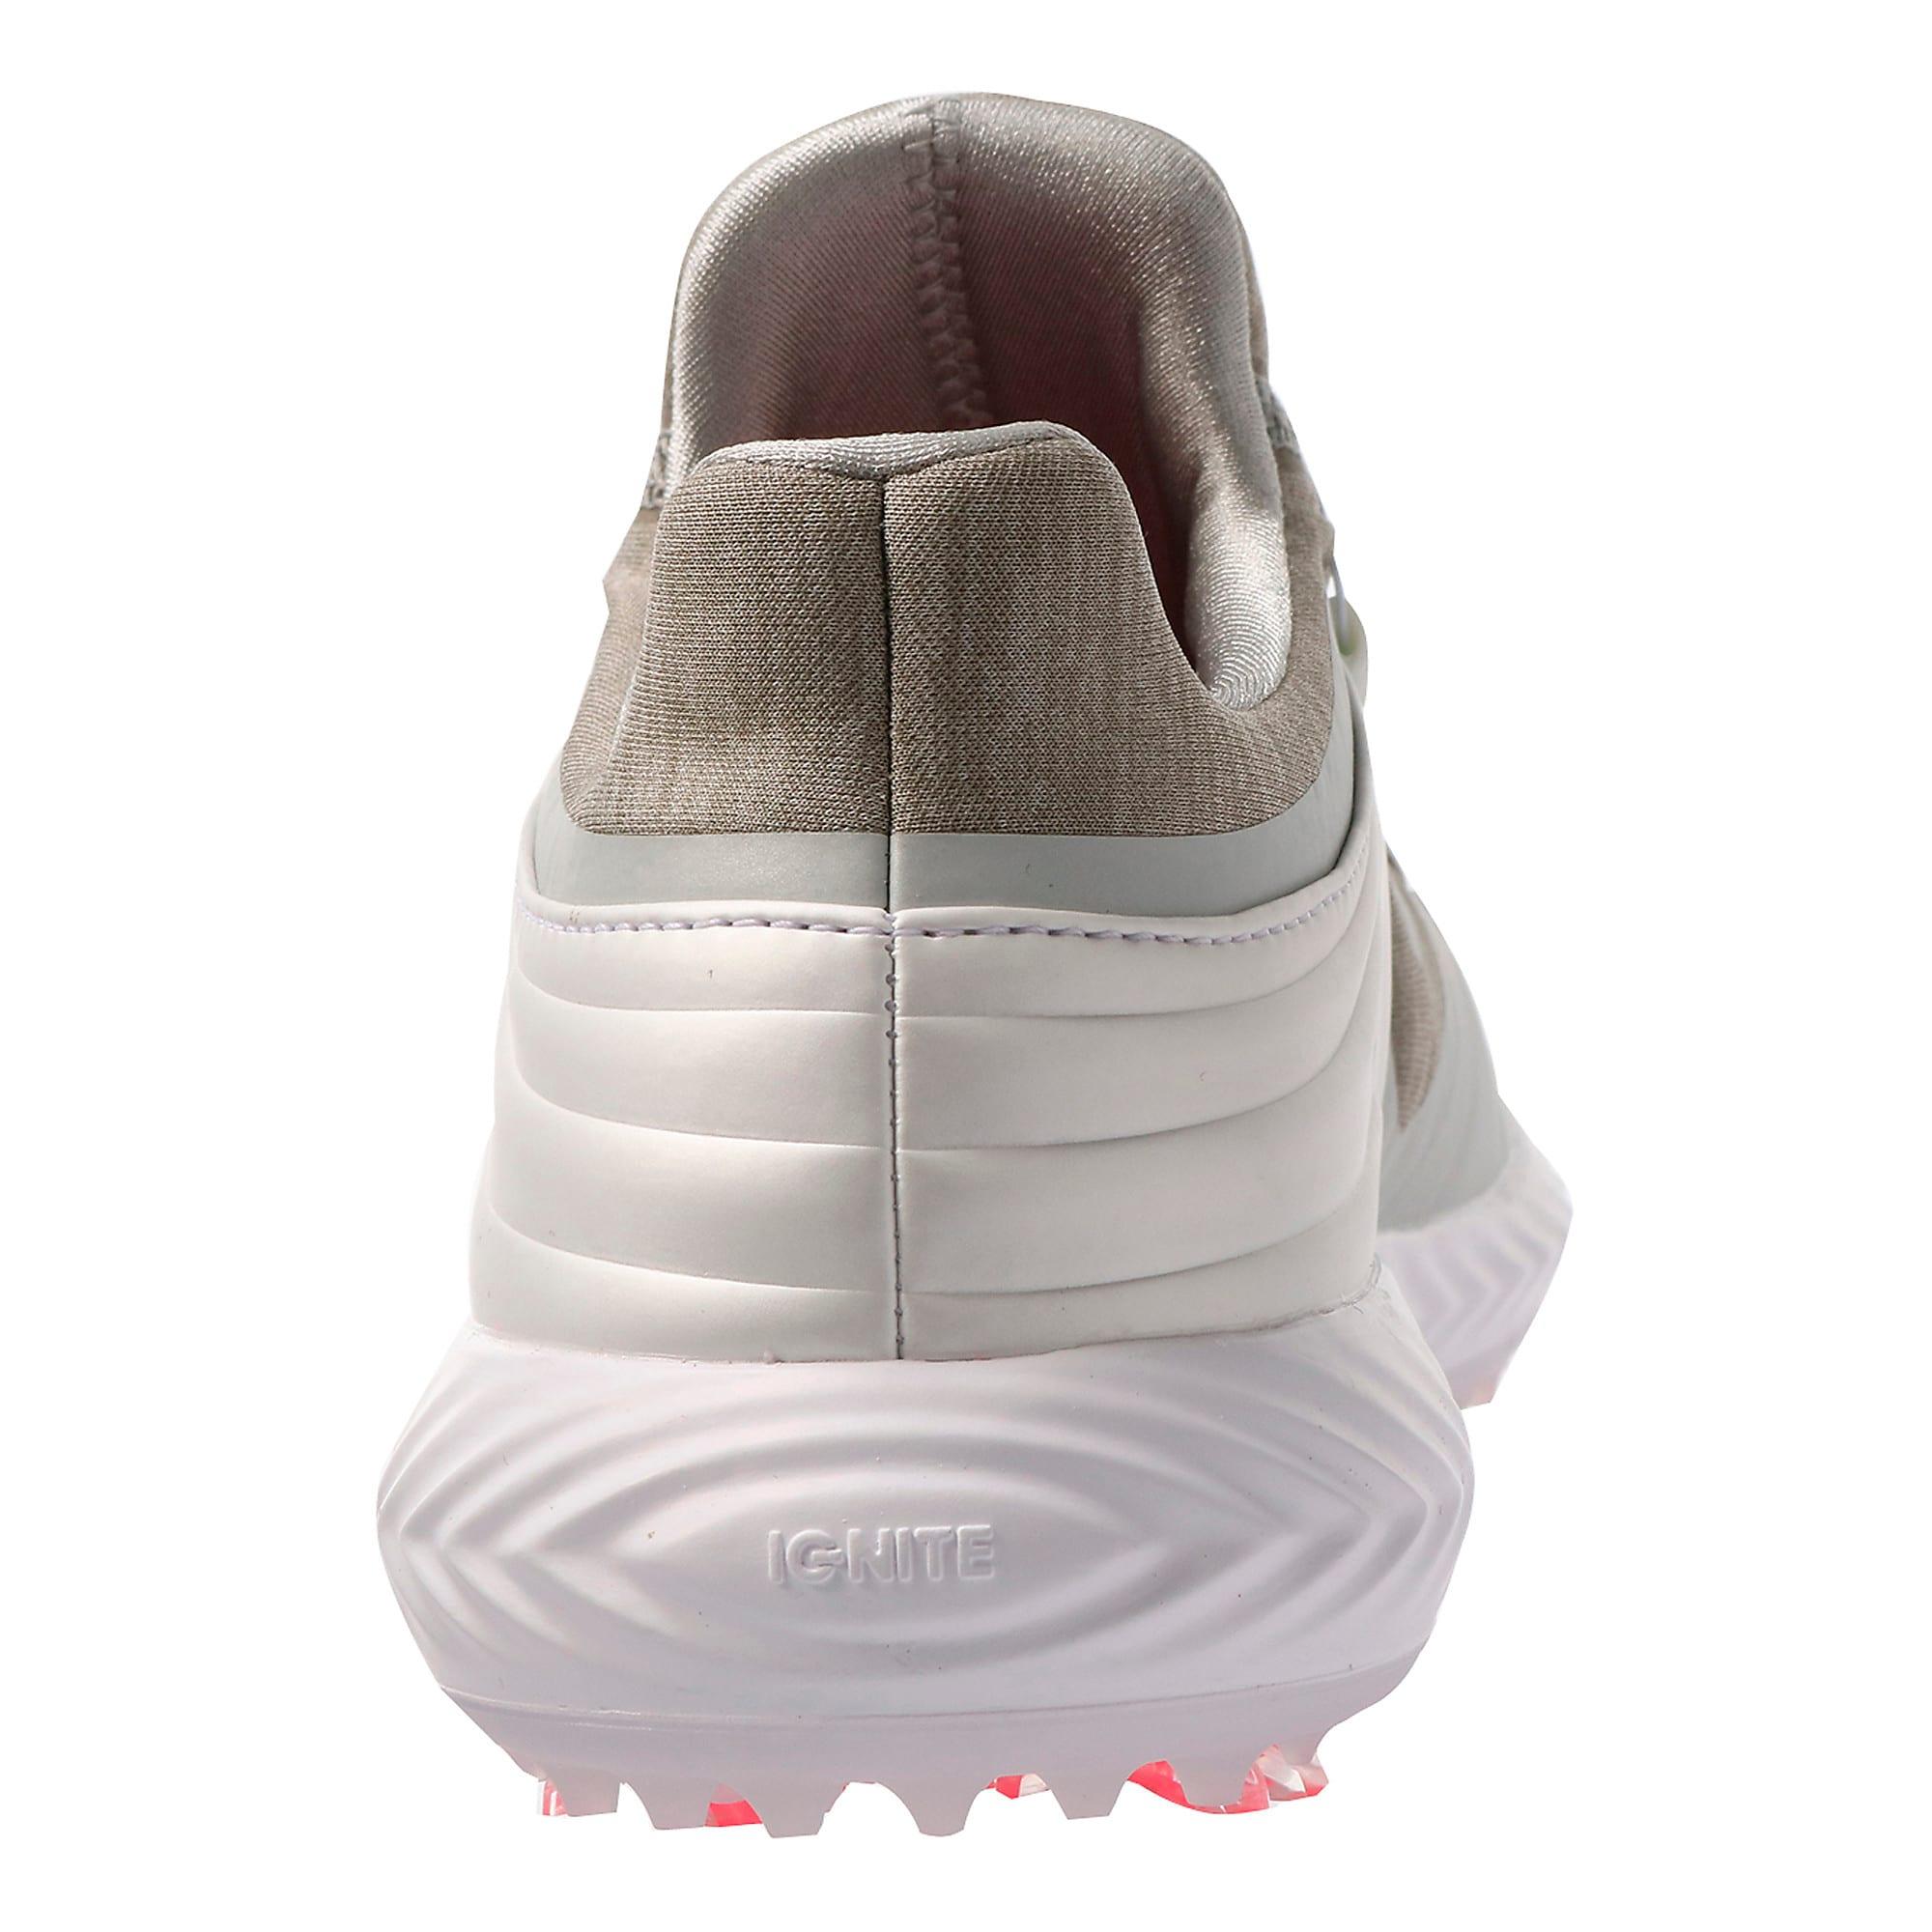 Thumbnail 4 of IGNITE Blaze Sport DISC Women's Golf Shoes, Gray Violet-White, medium